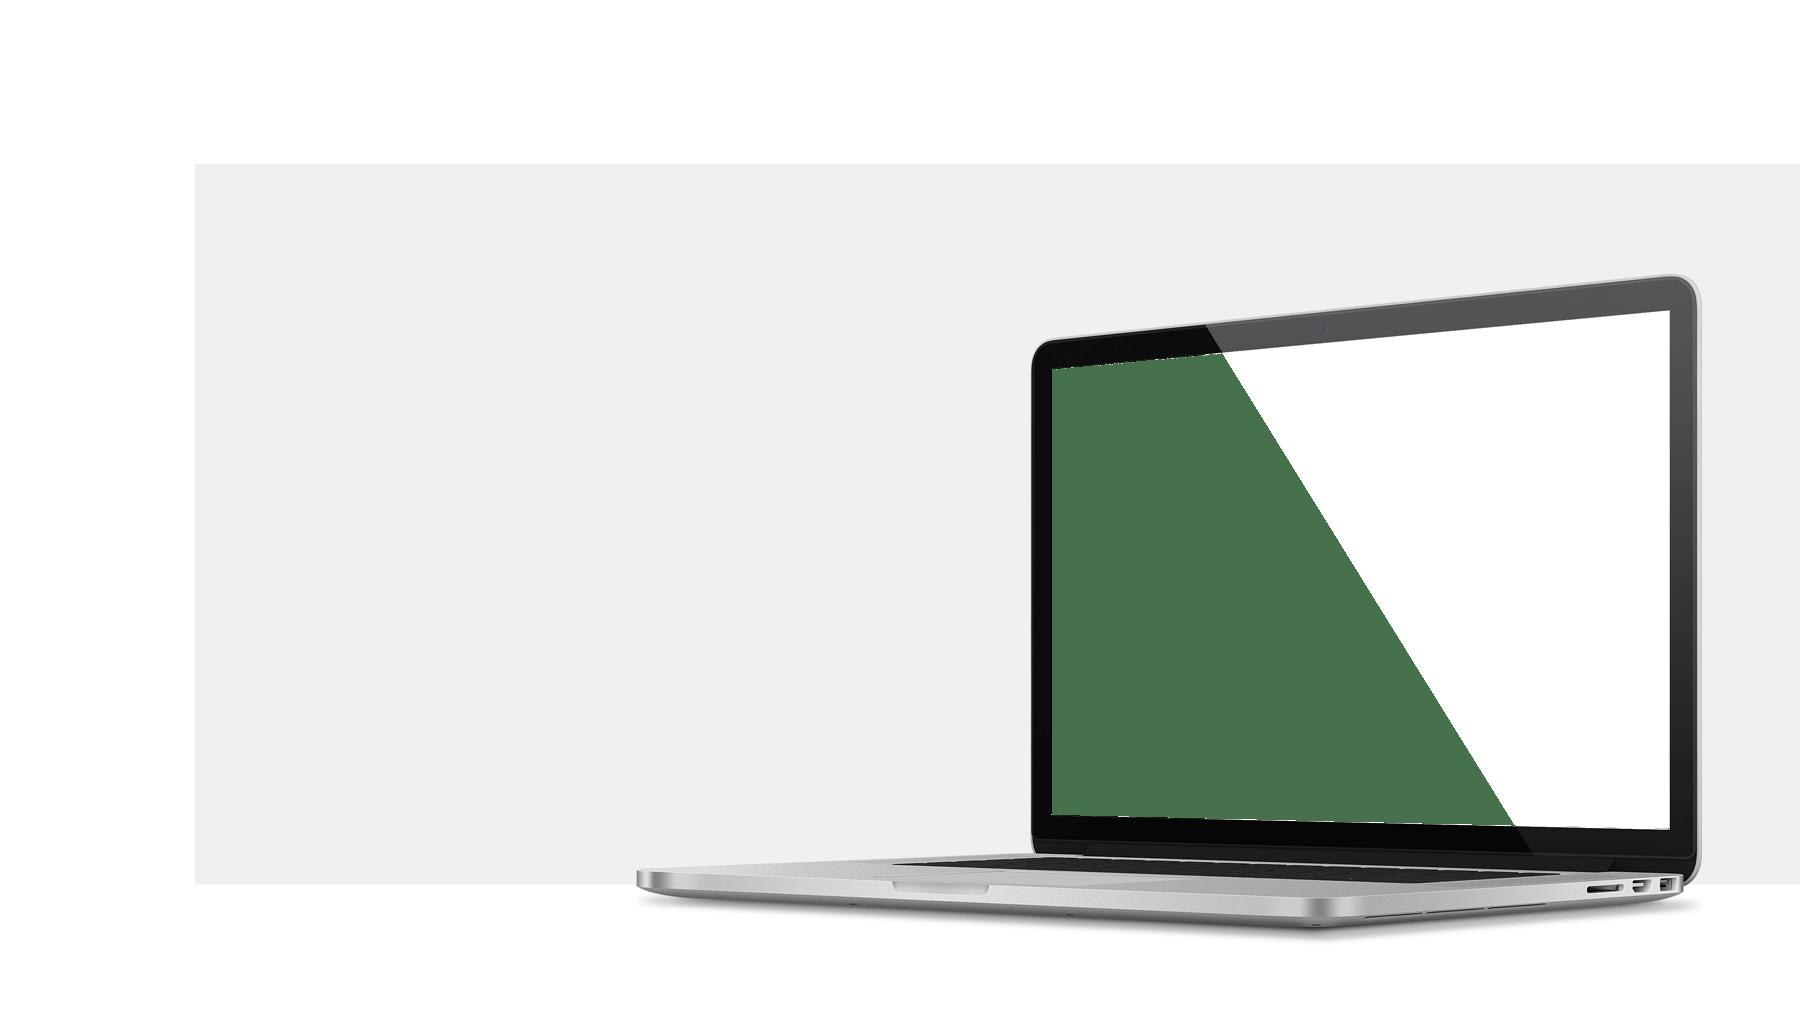 Mydiary: Transparent Background Laptop Mockup Png